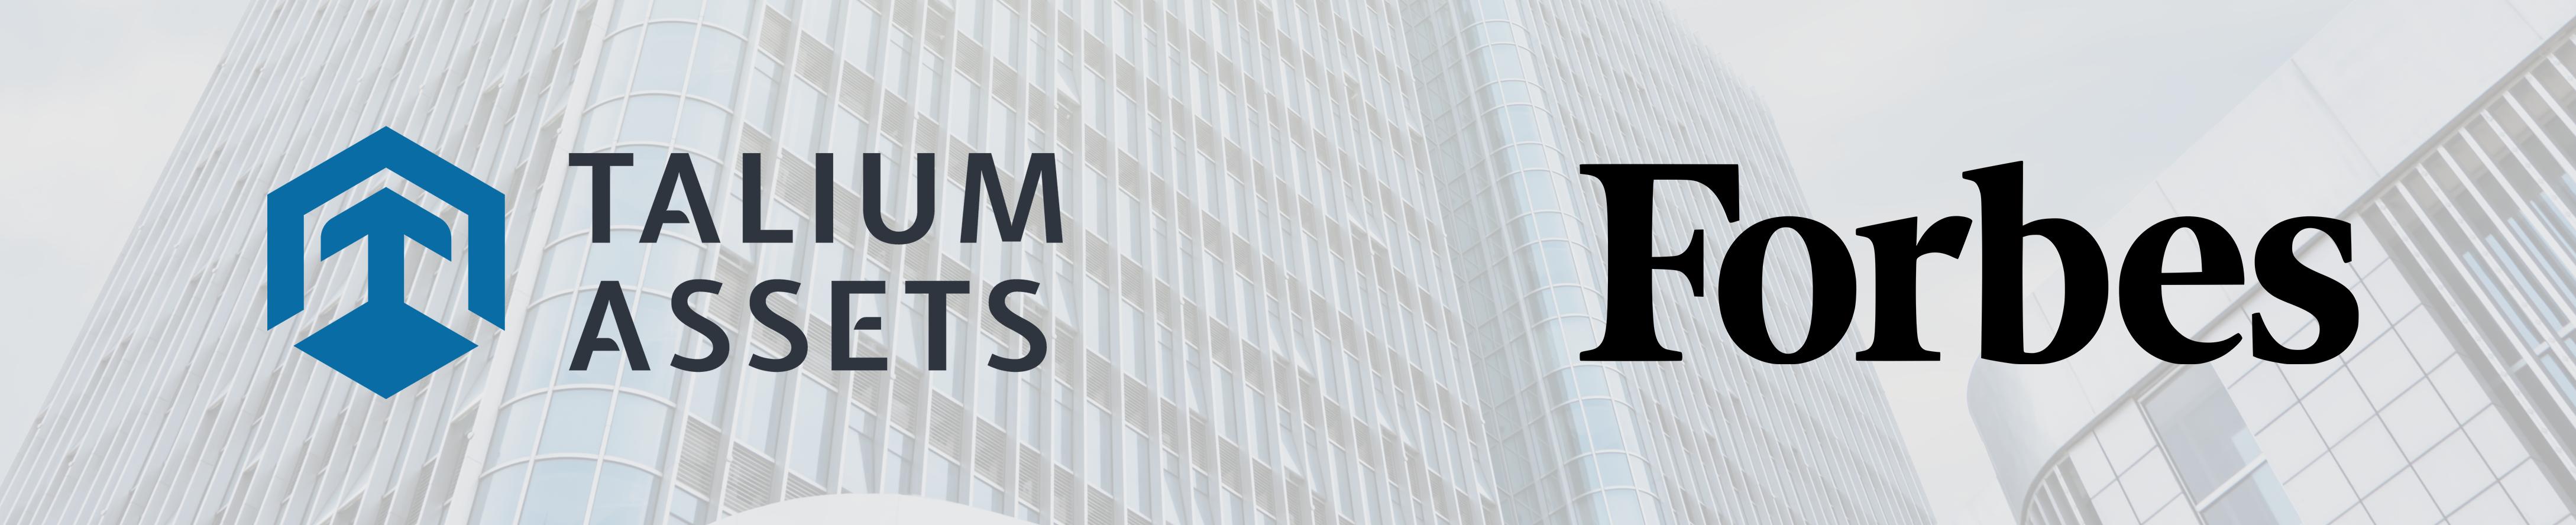 Talium Assets et Forbes